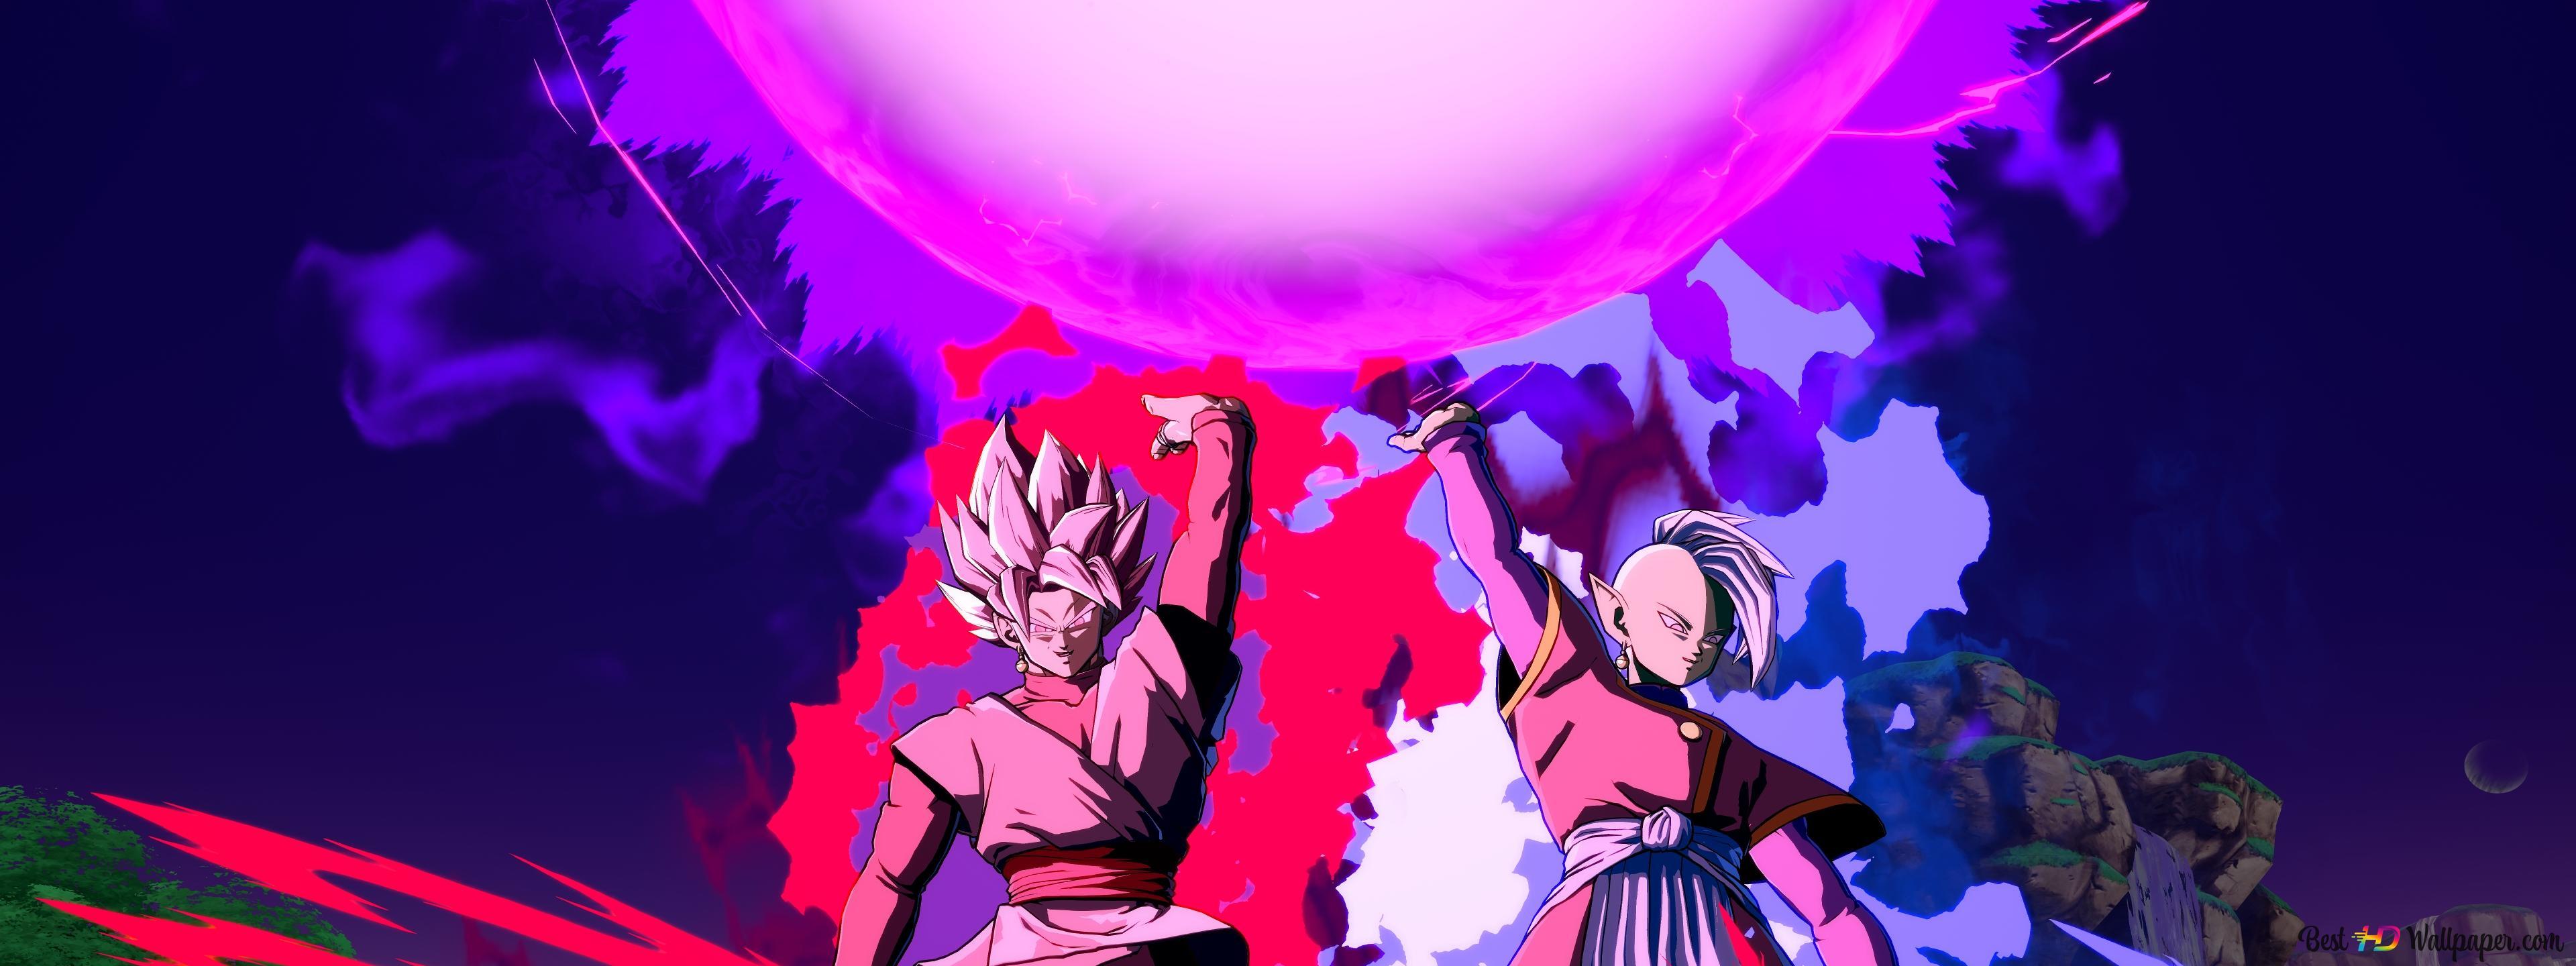 Black Goku Hd Wallpaper Download